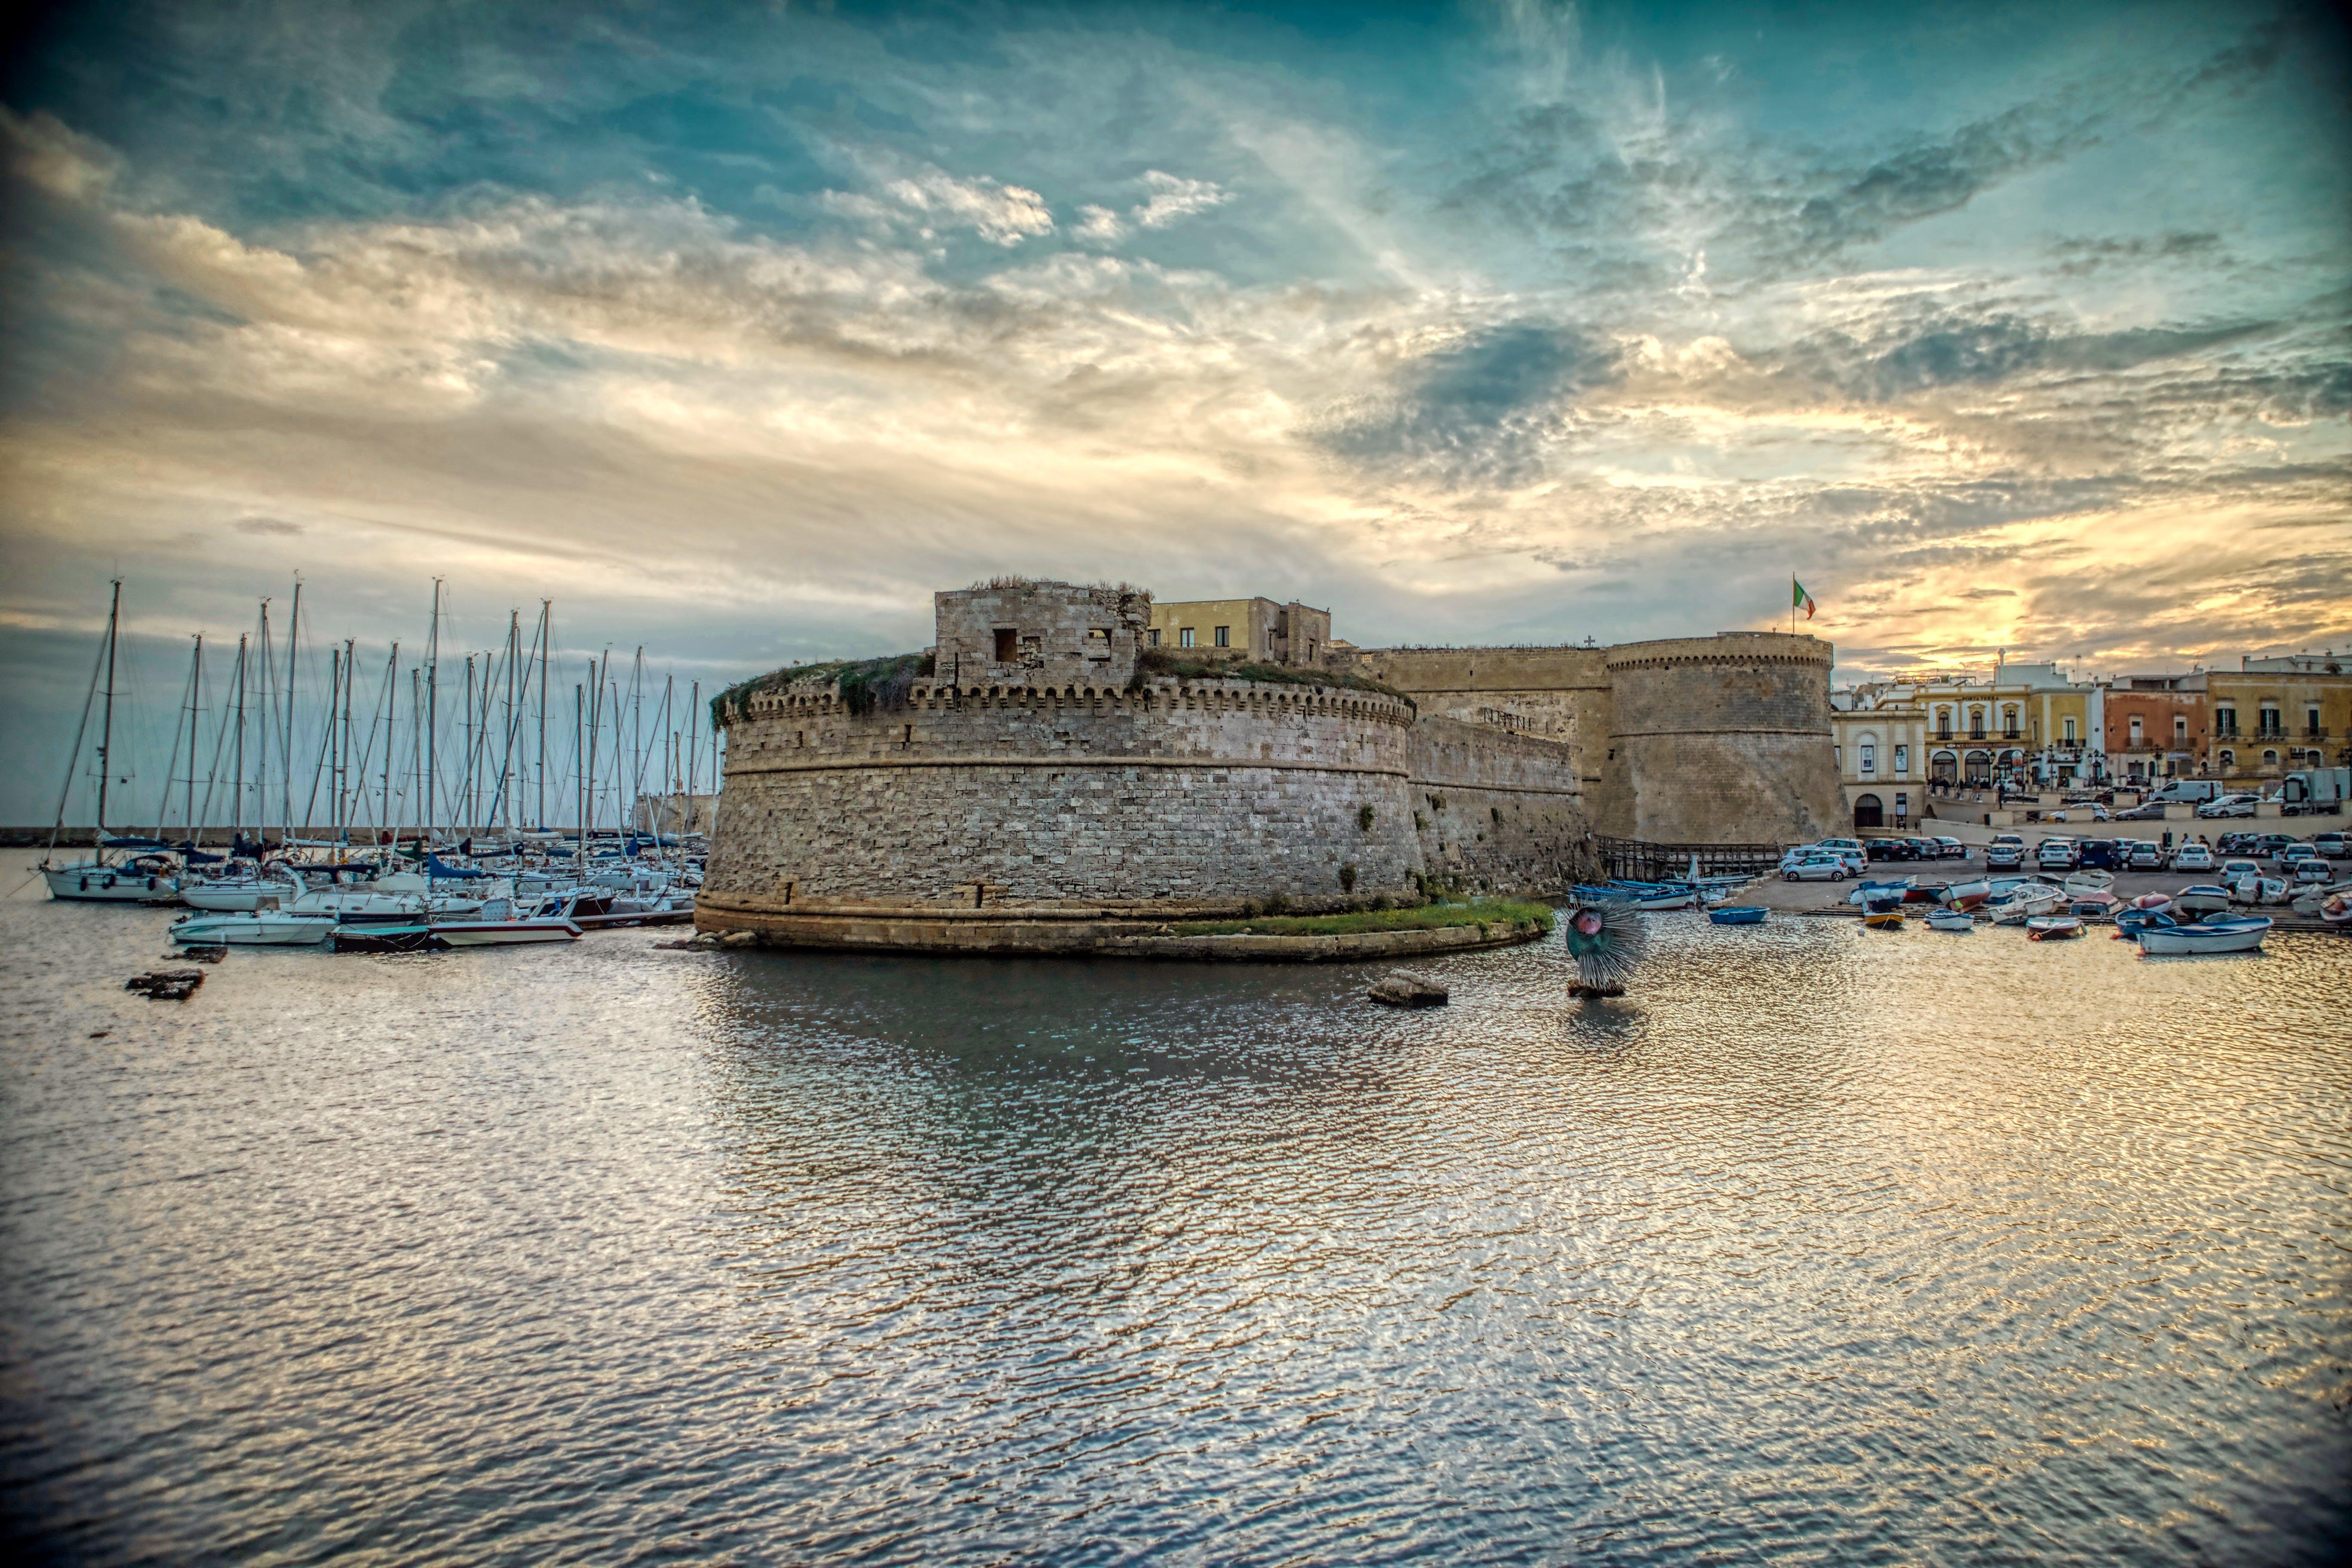 boats, castle, clouds